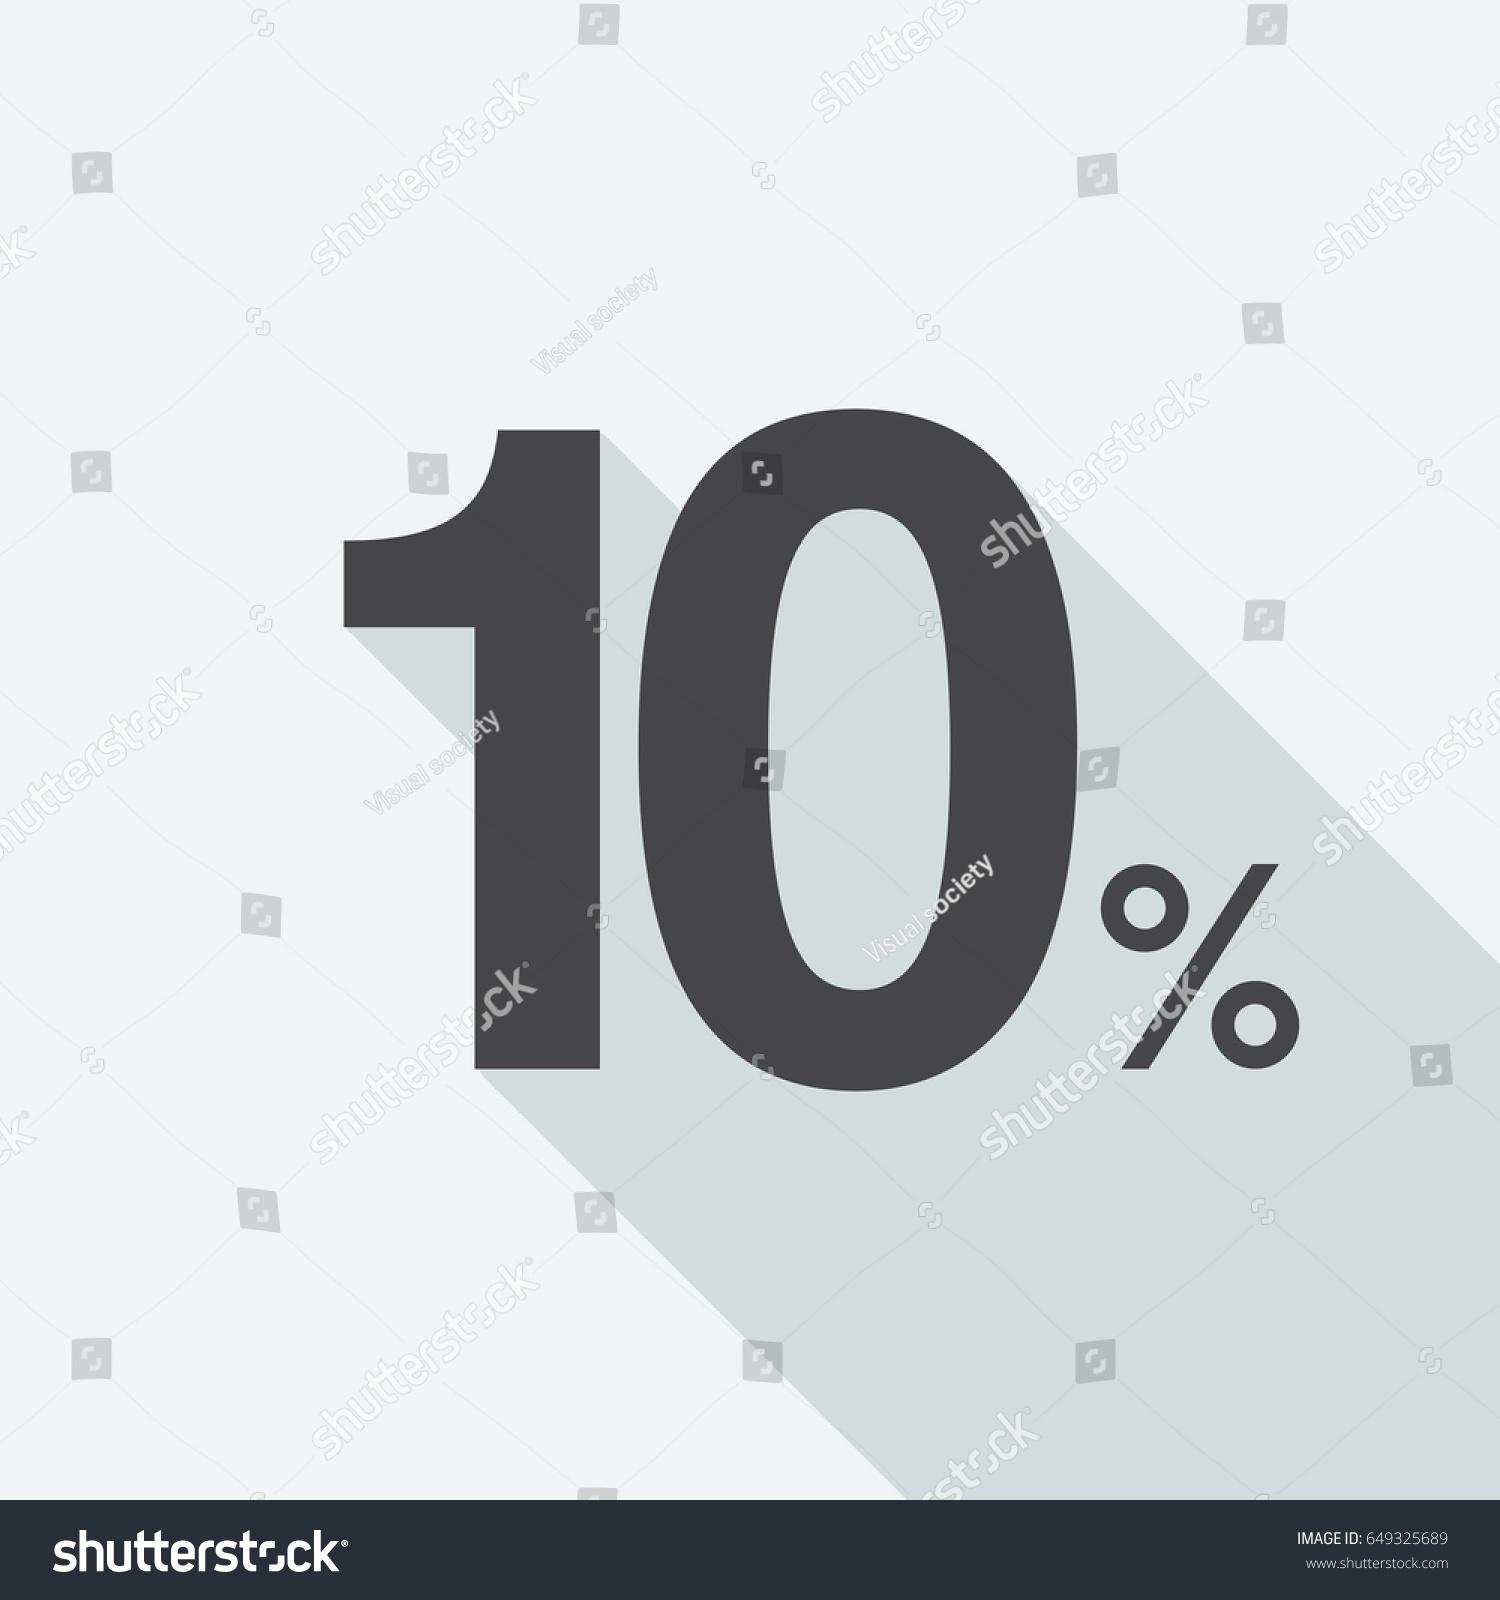 10 Ten Percent Long Shadow On Stock Vector 649325689 Shutterstock